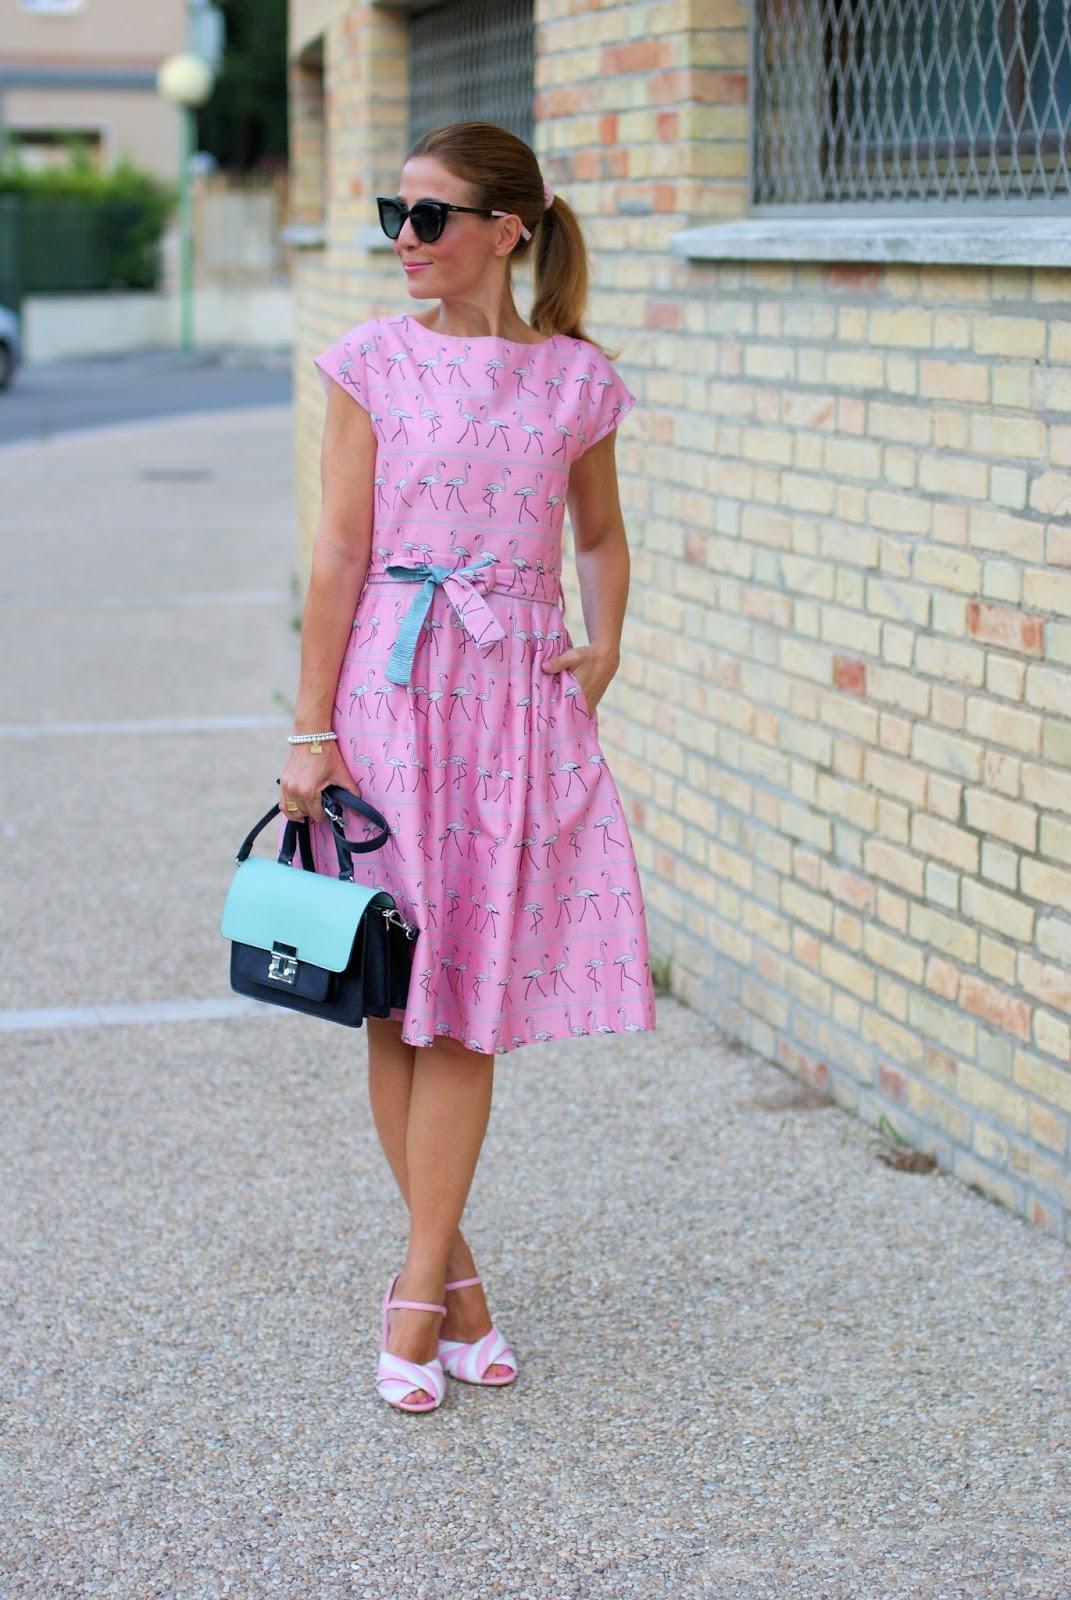 Pink walking flamingo dress on Fashion and Cookies fashion blog, fashion blogger style